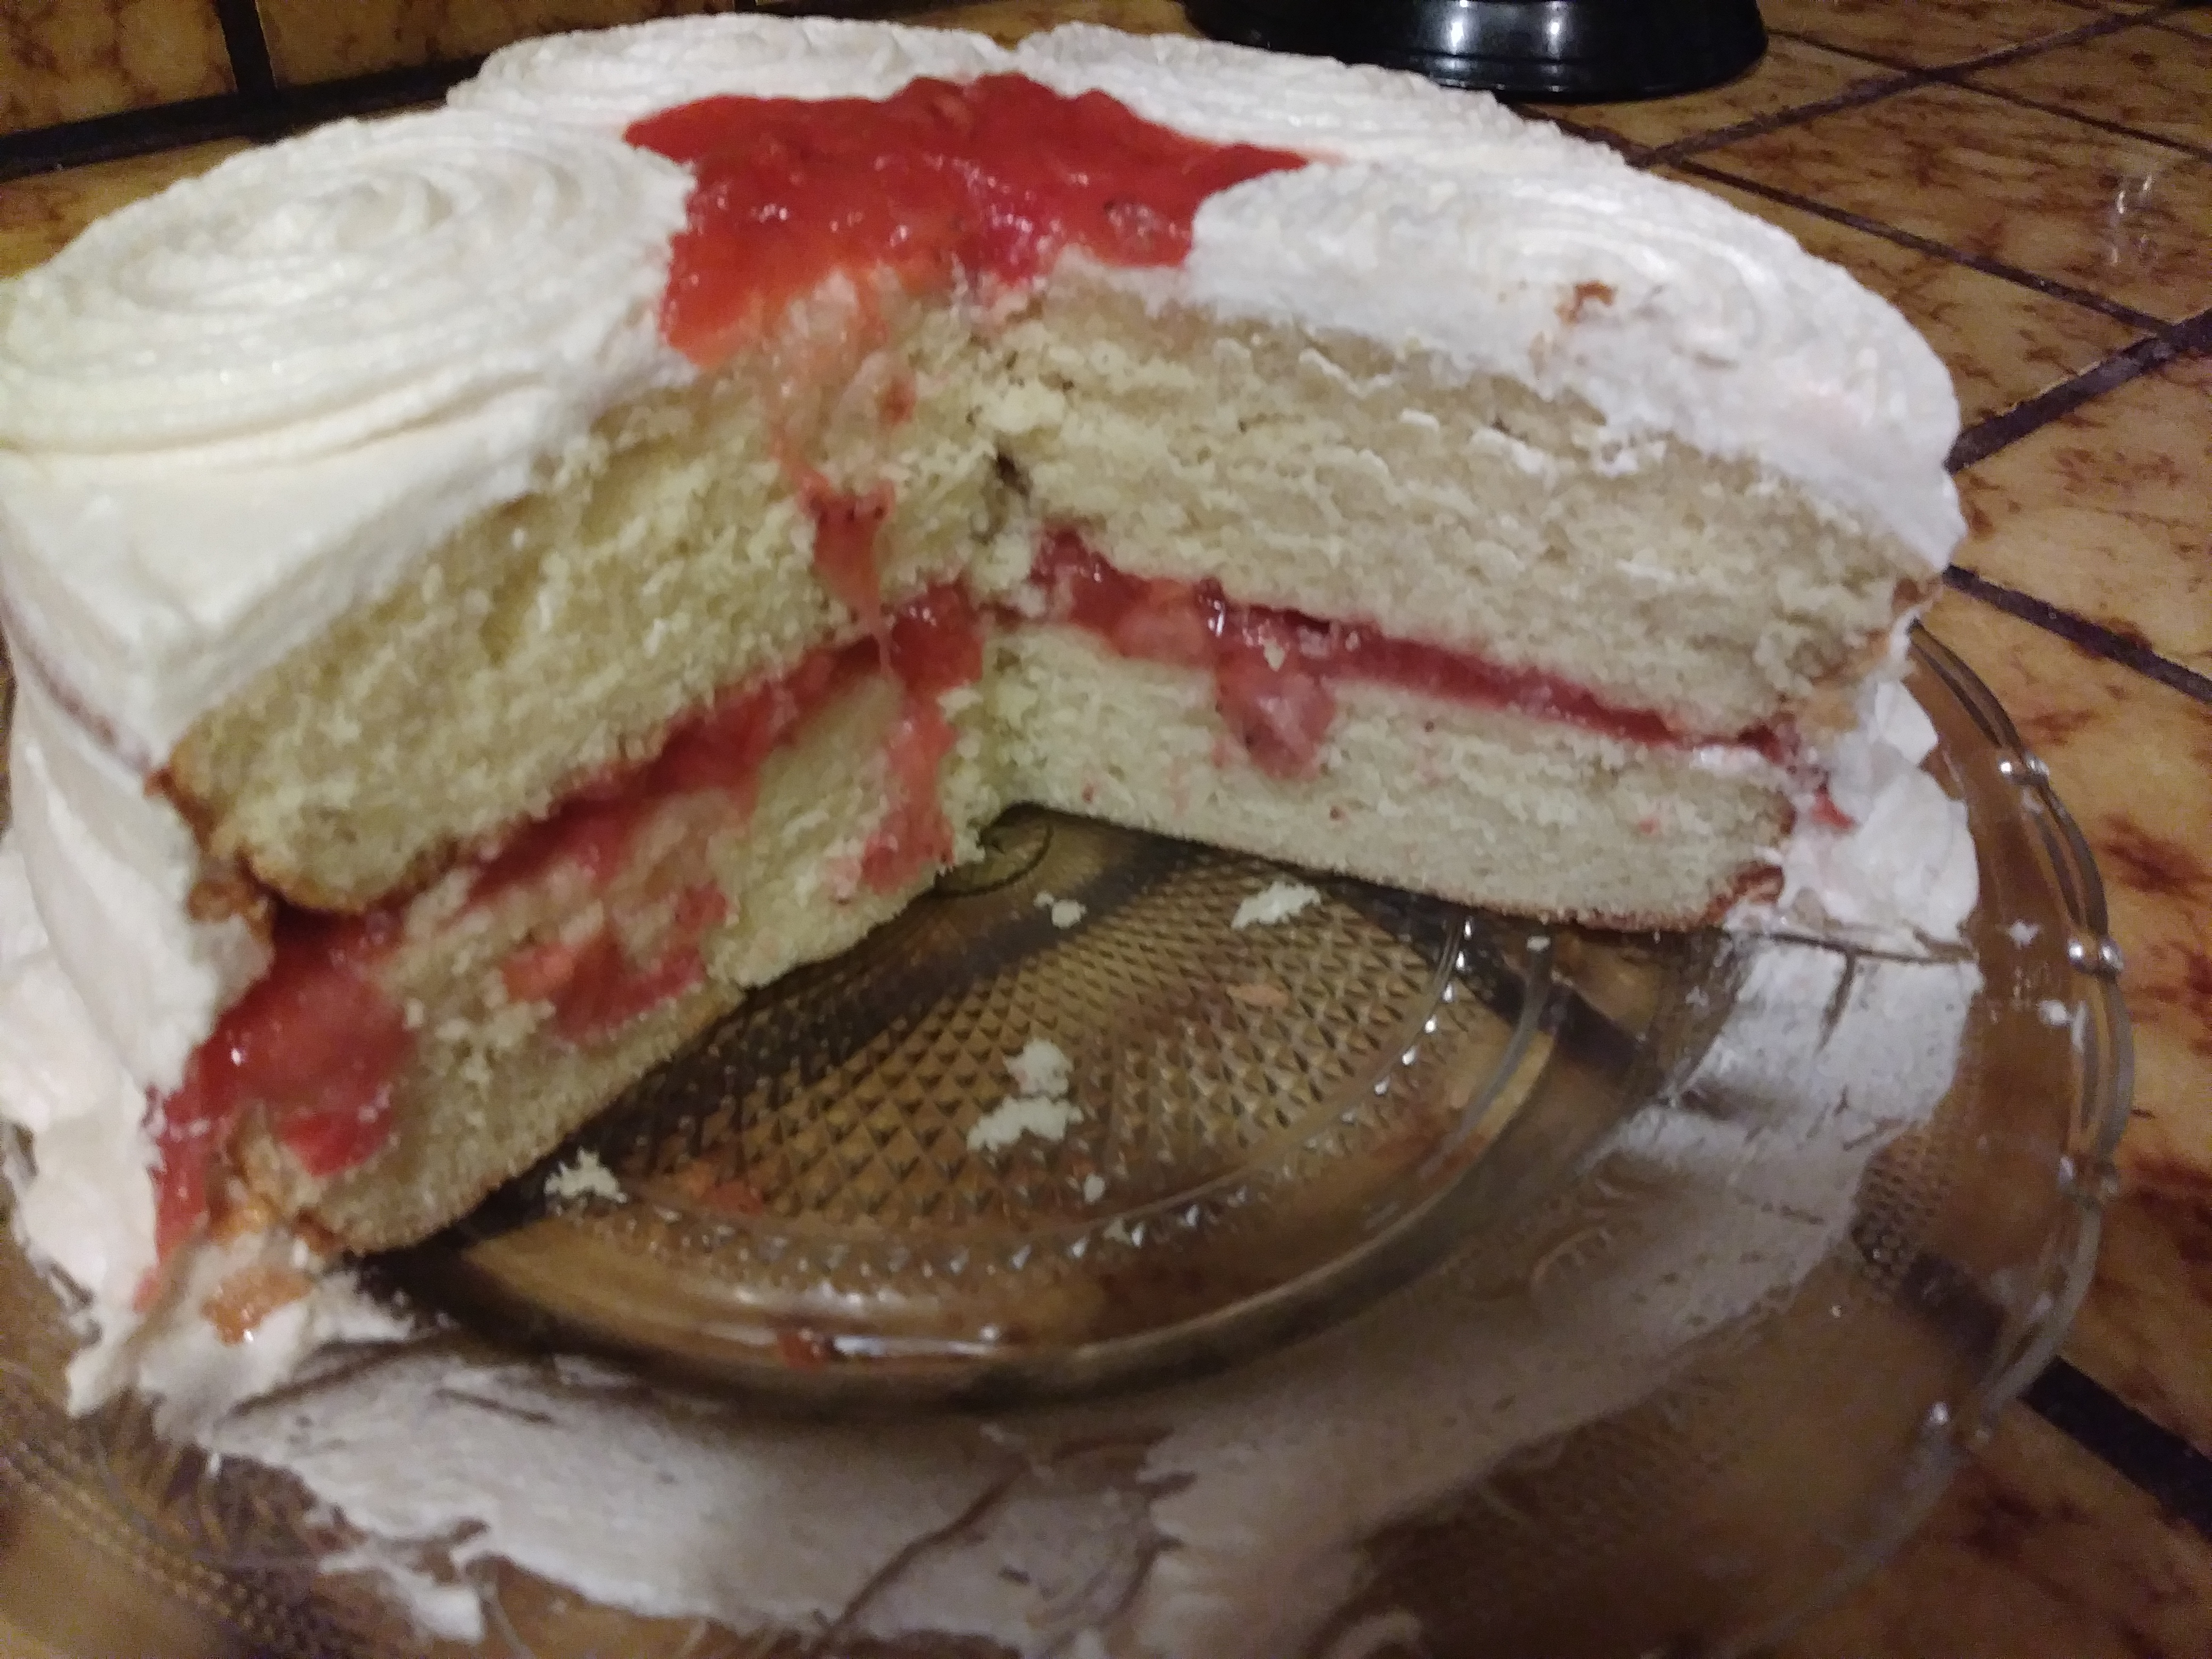 Vanilla Layer Cake with Strawberries Crystal Lirette